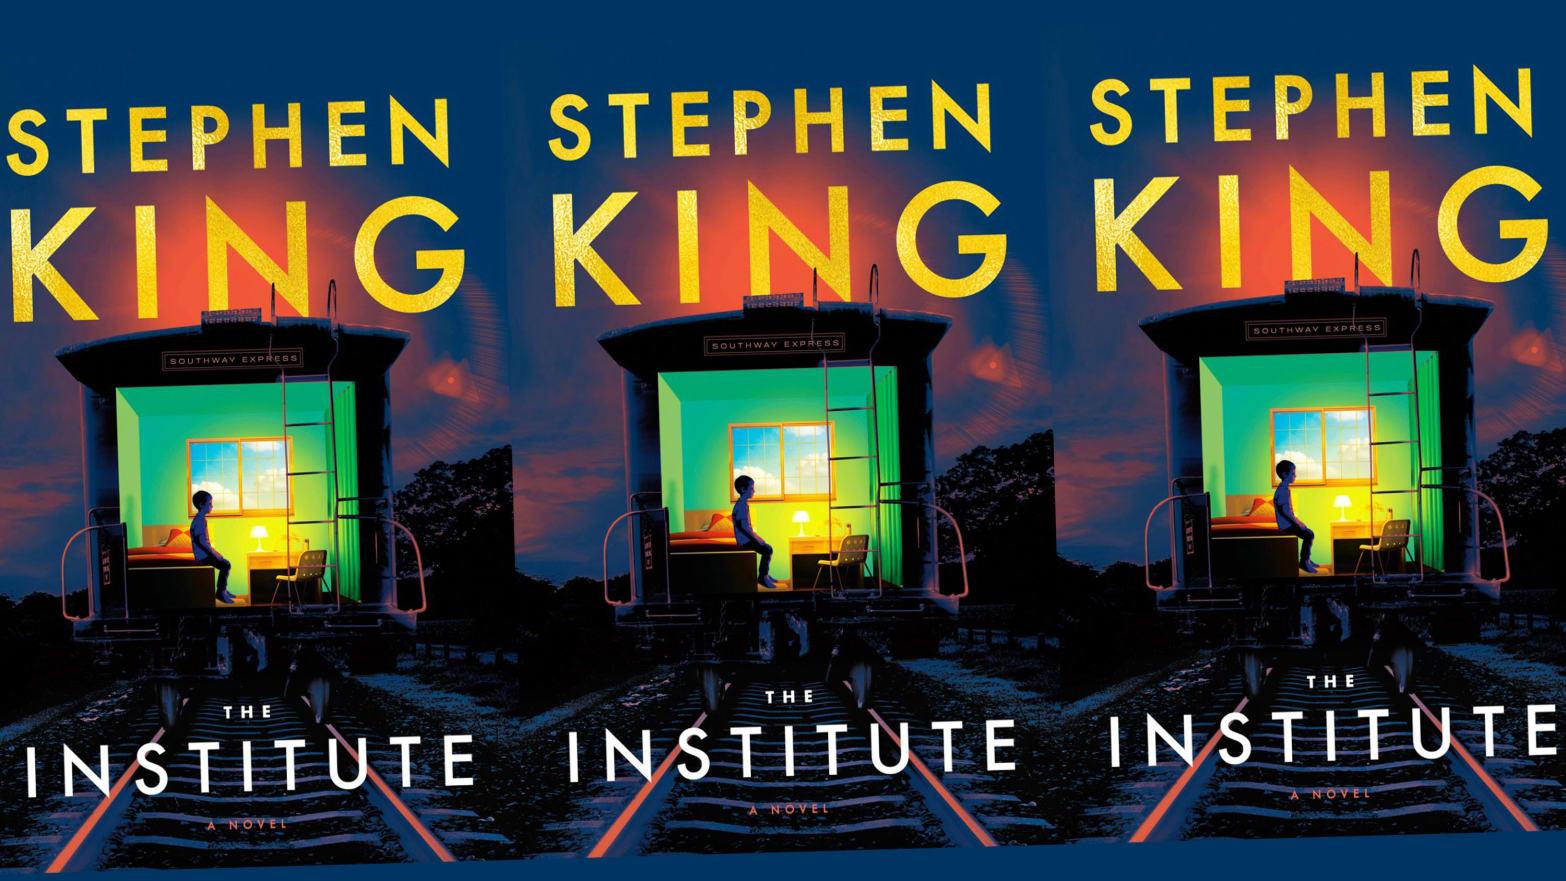 Stephen King's Imprisoned Kids Mirror the Horror at the Border